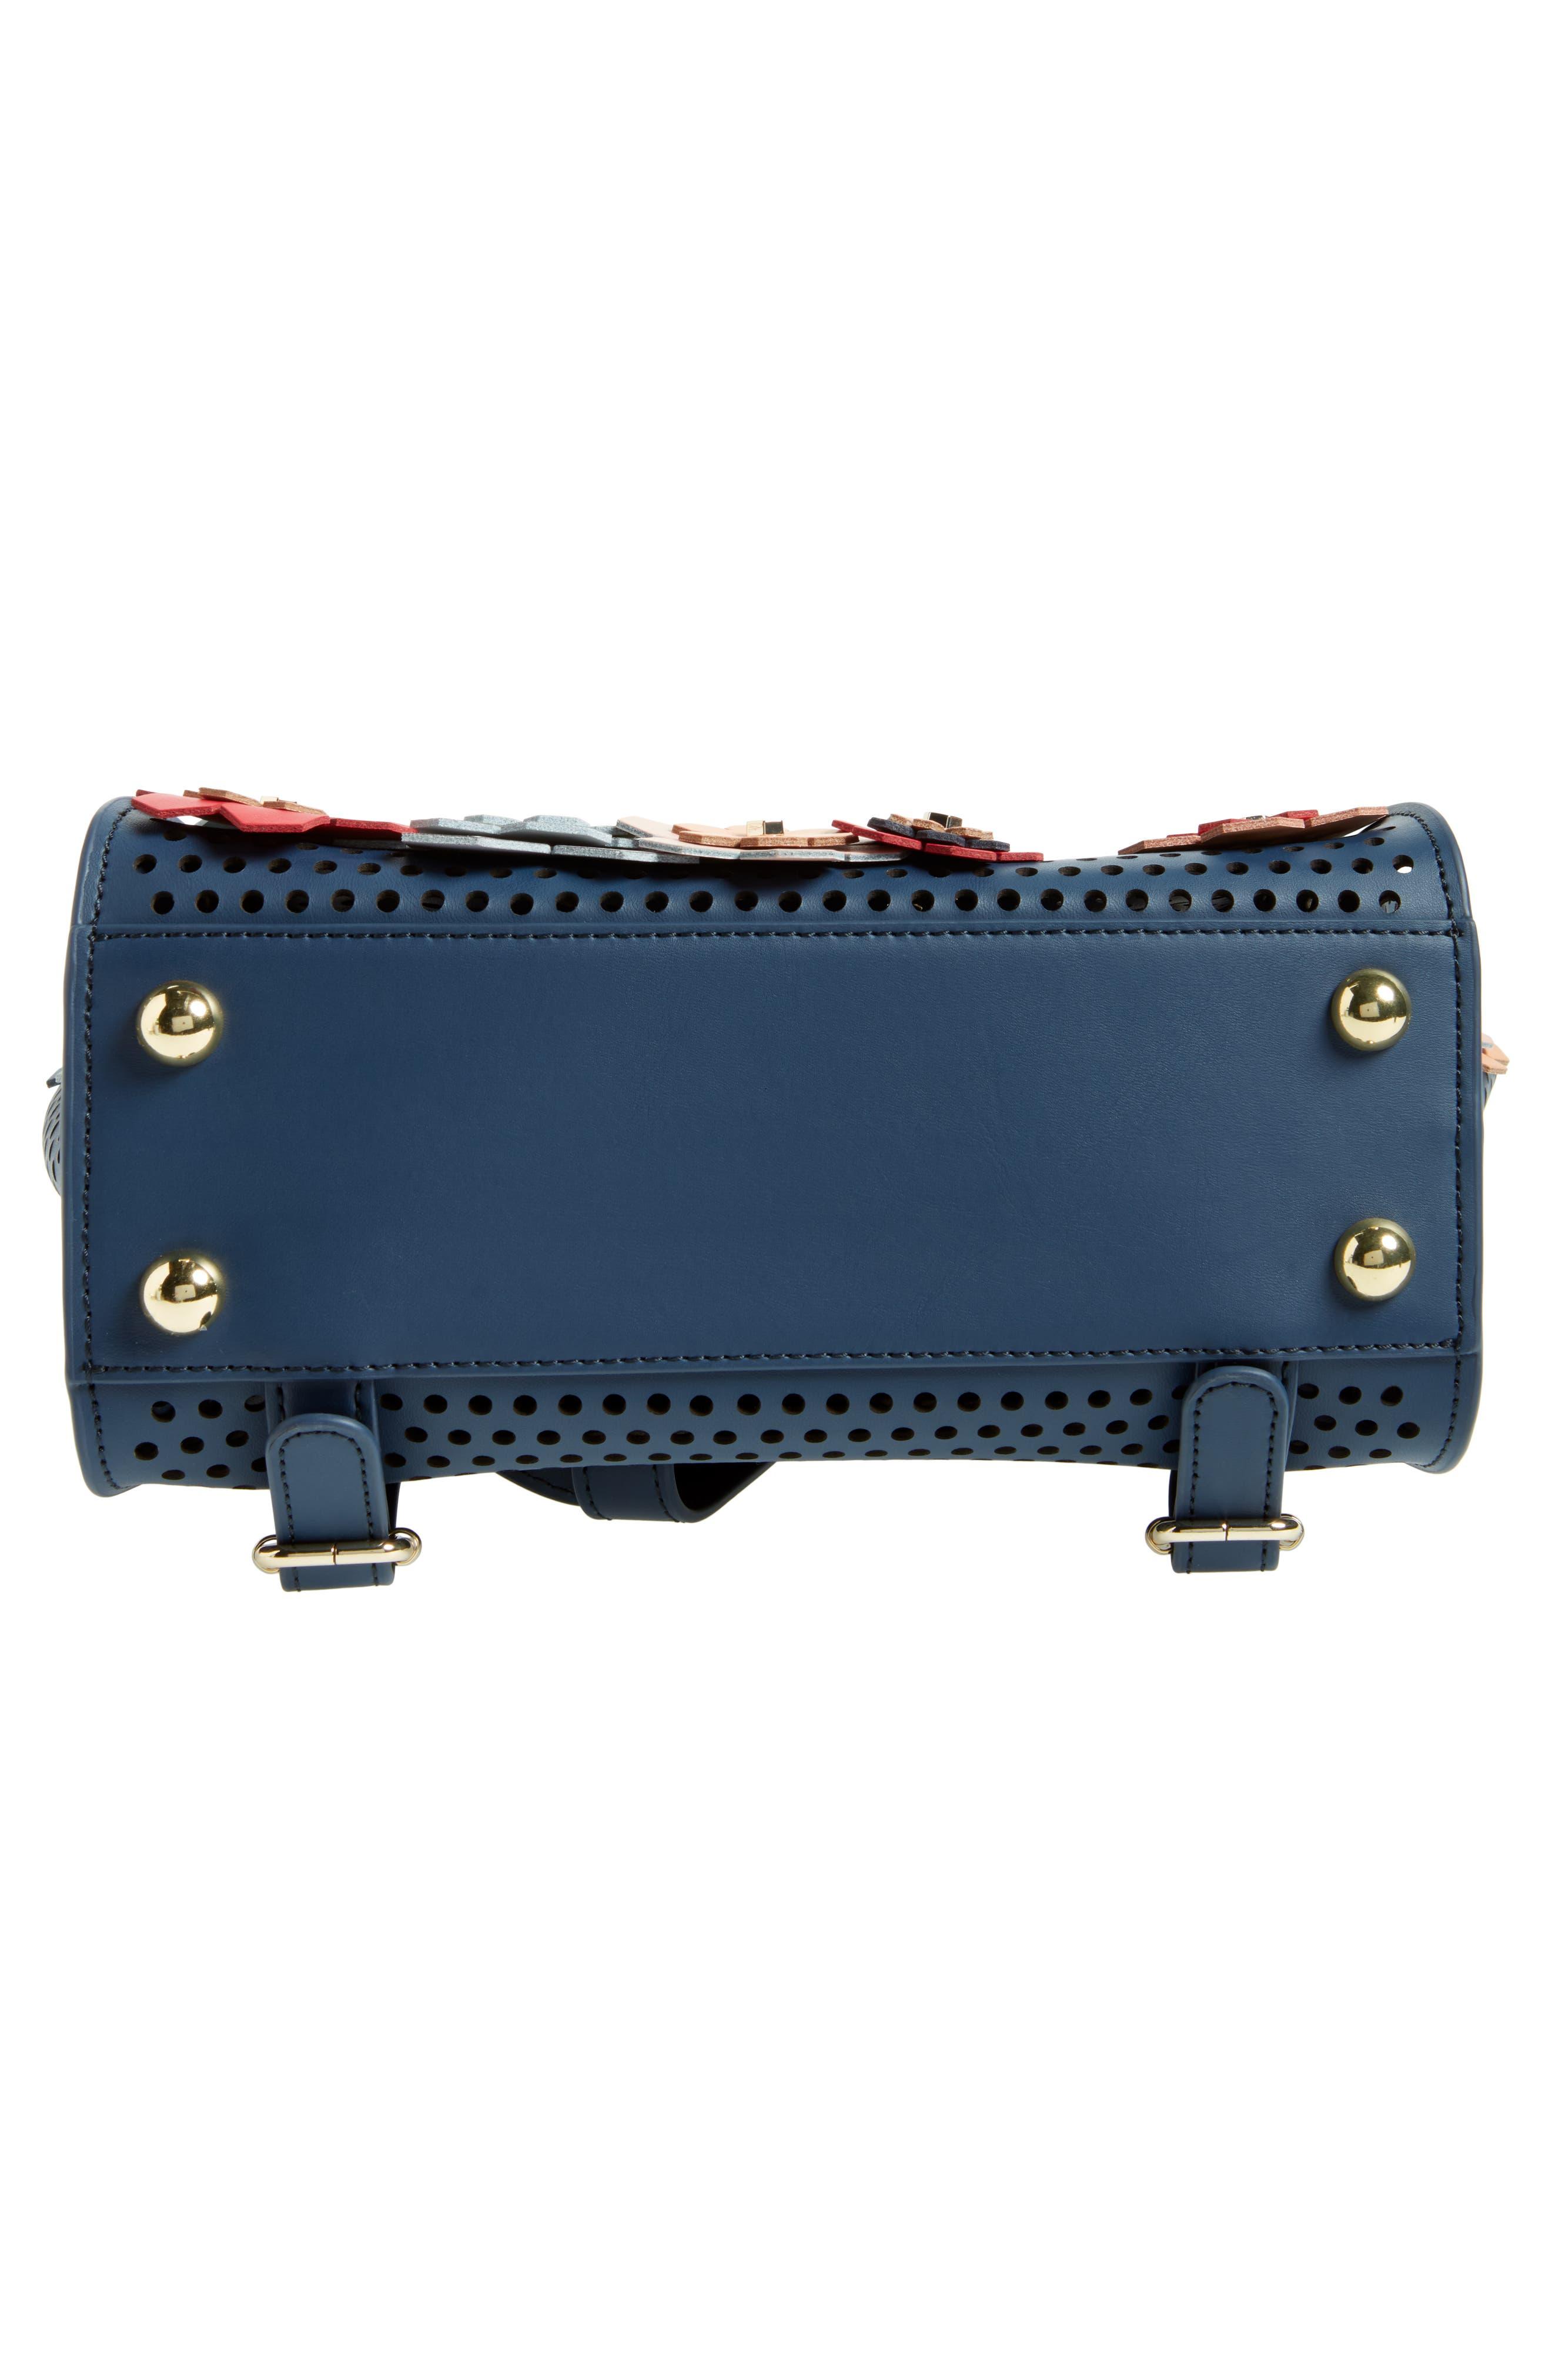 Eartha Kit Convertible Calfskin Leather Backpack,                             Alternate thumbnail 7, color,                             Blue/ Rainbow